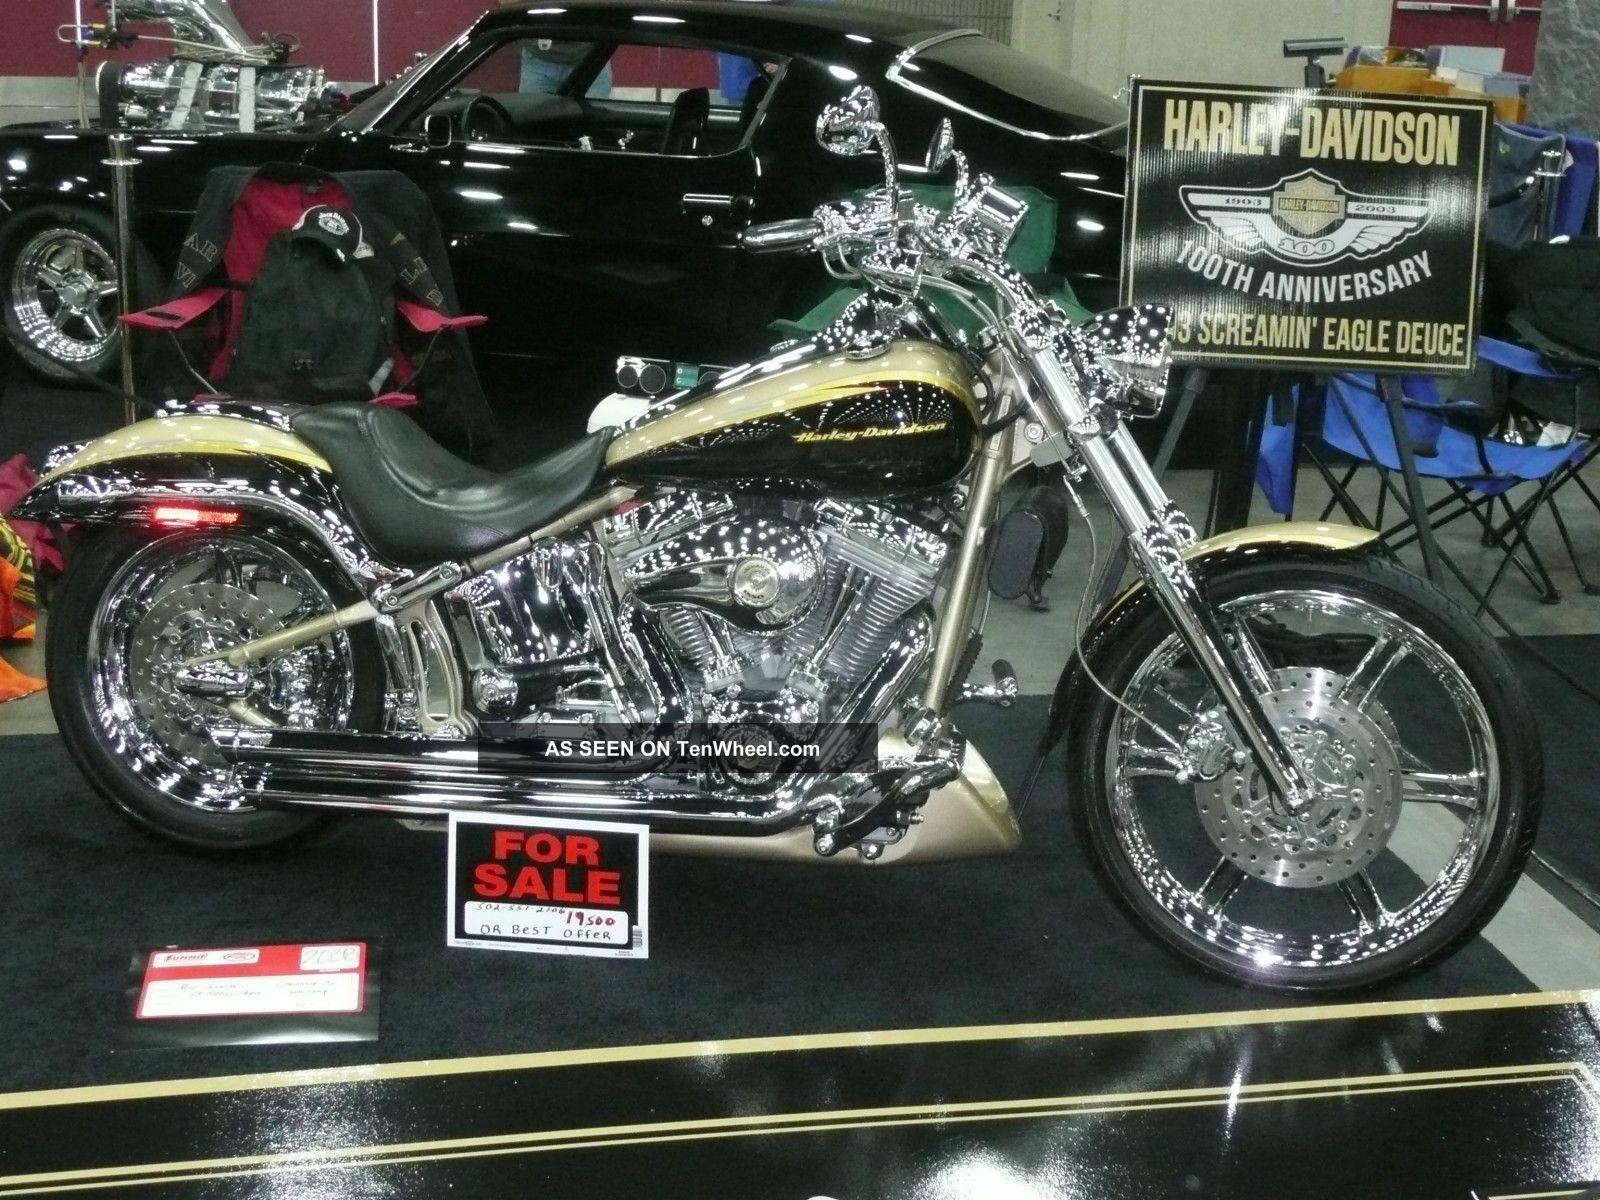 2003 100th Anniversary Cvo Harley Davidson Screaming Eagle Deuce